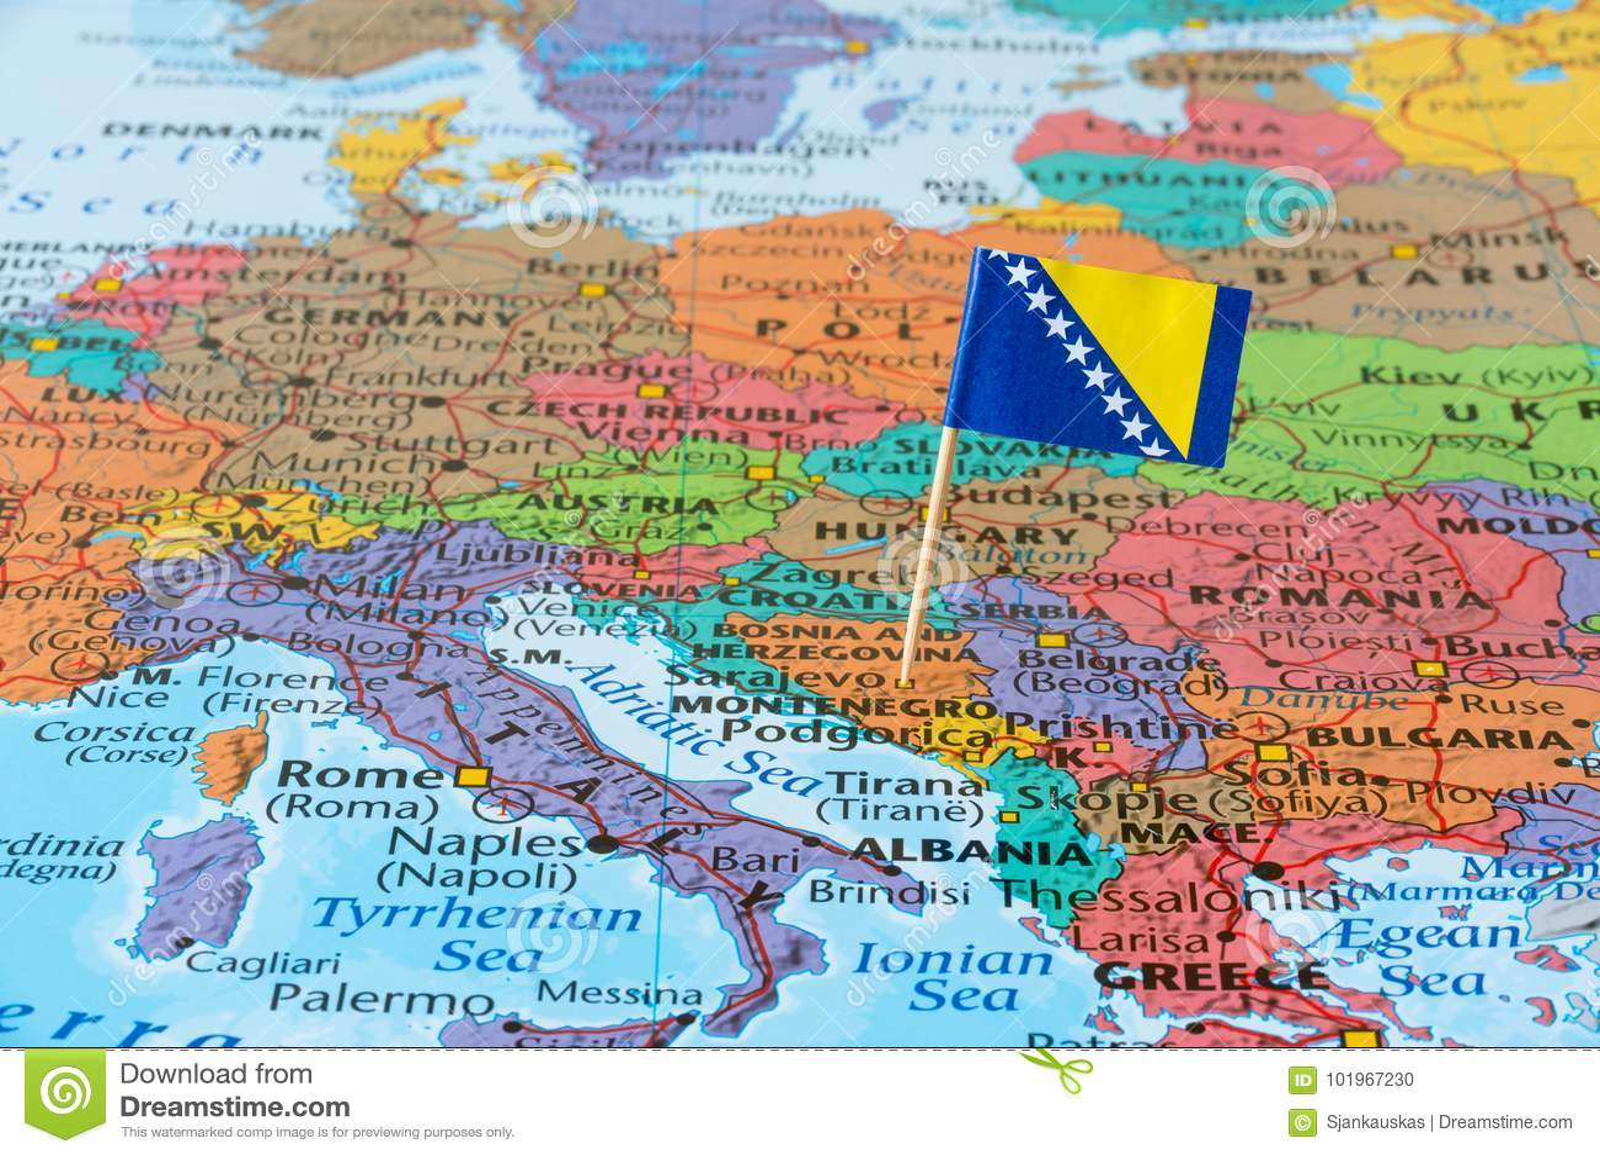 Bosnia And Herzegovina Map Stock Photo Image Of Detail 101967230